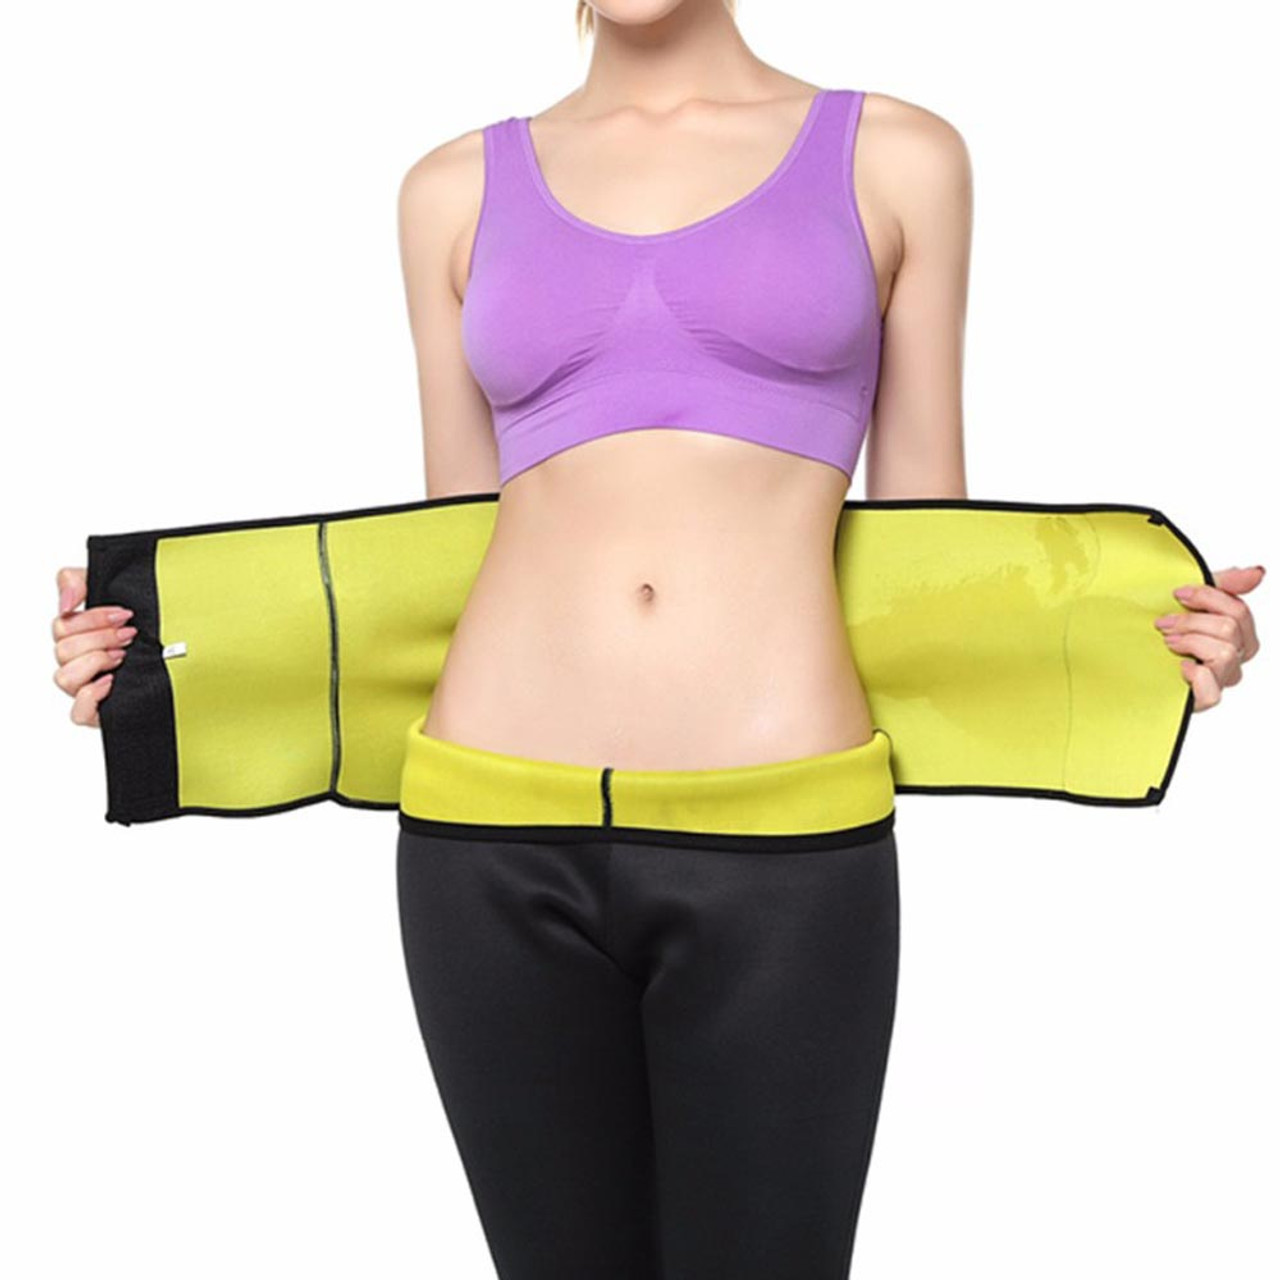 0da340e645917 Neoprene Womens Ab Shaper Adjustable Belt Velcro Waist Trimmer Sweat  Slimming Belt for Weight Loss by Kaneesha - FREE SHIPPING - www.kaneesha.com